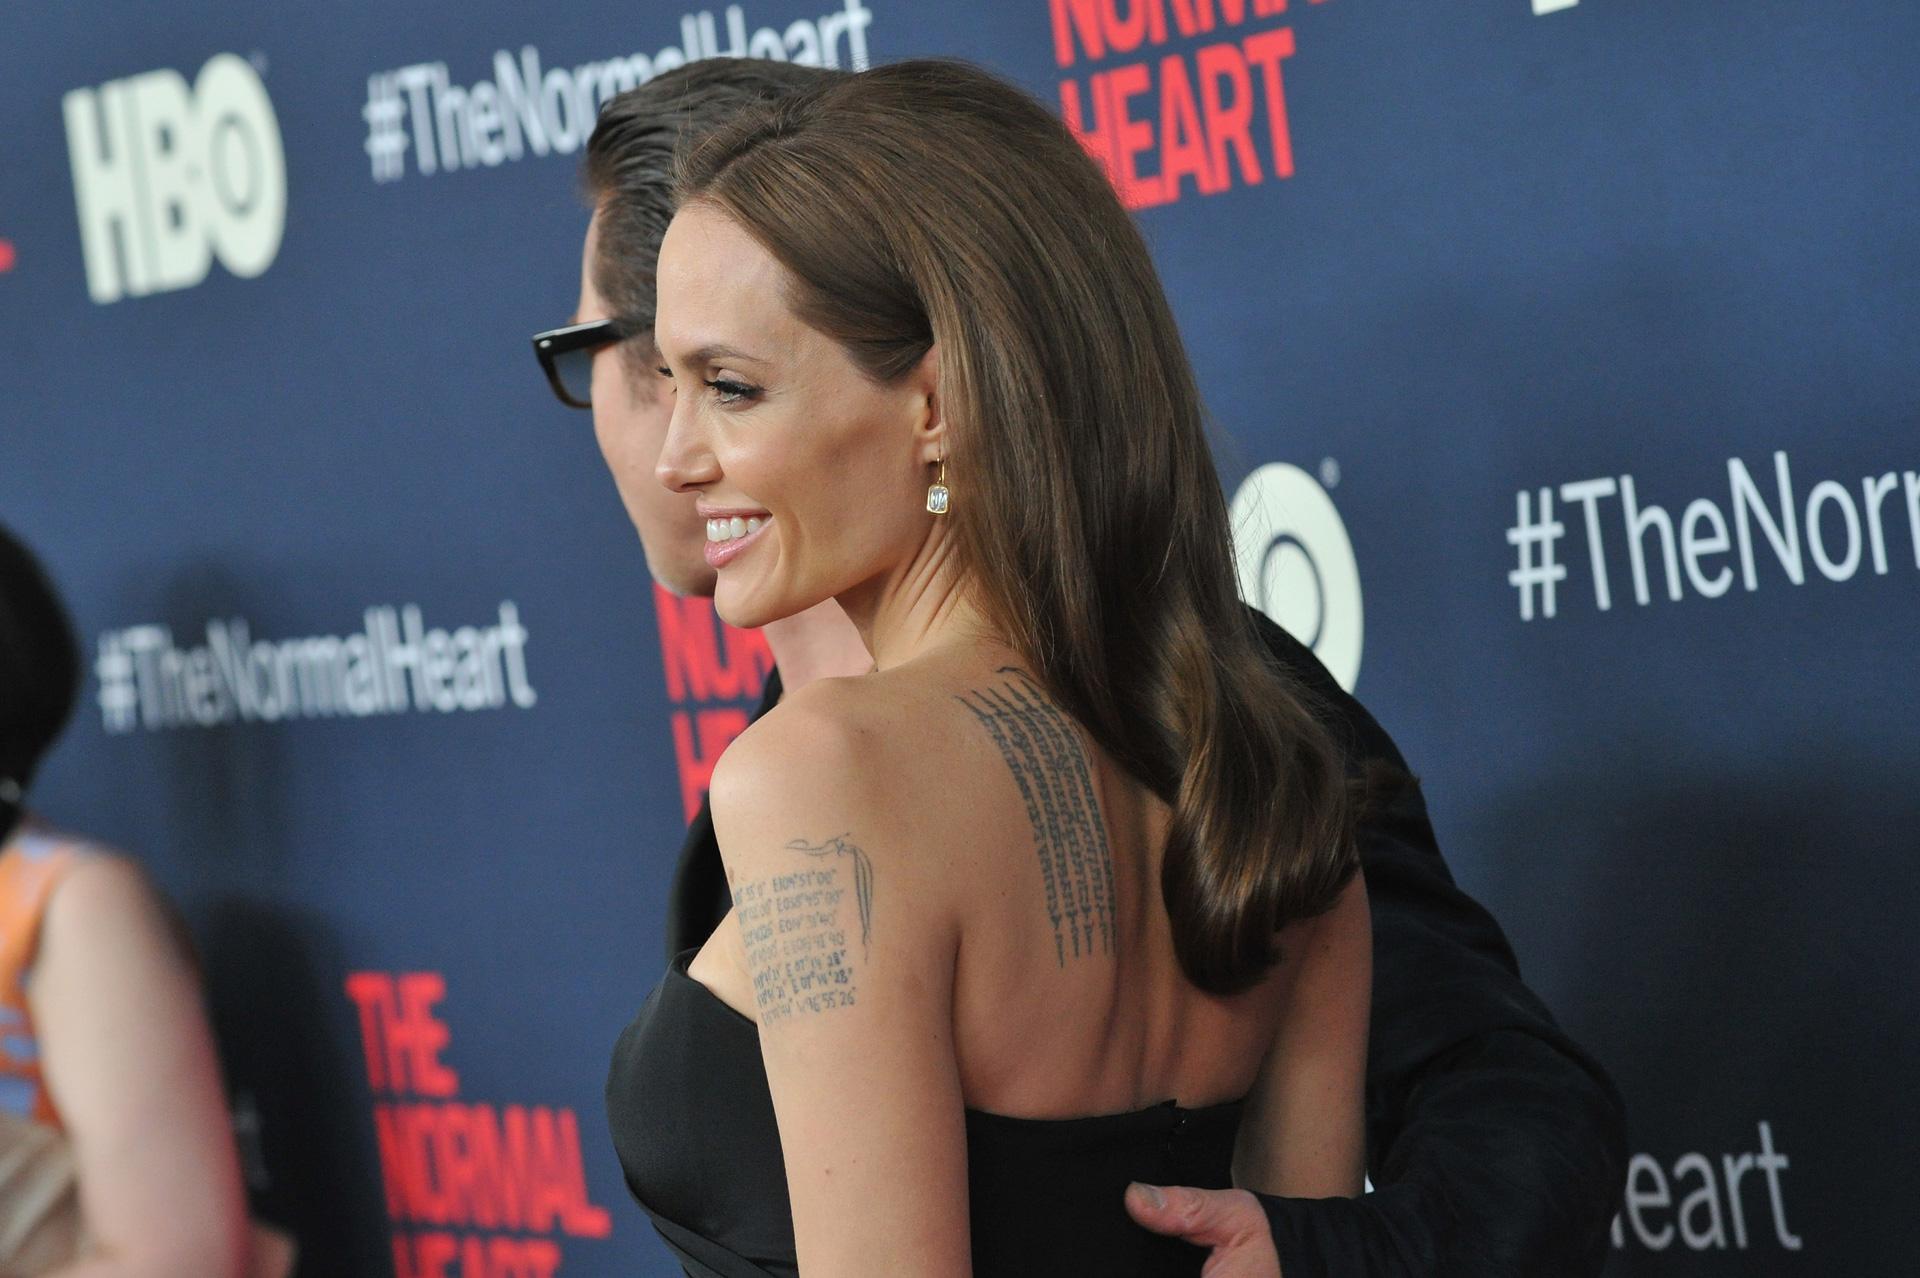 Angelina Jolie's makeup blunder